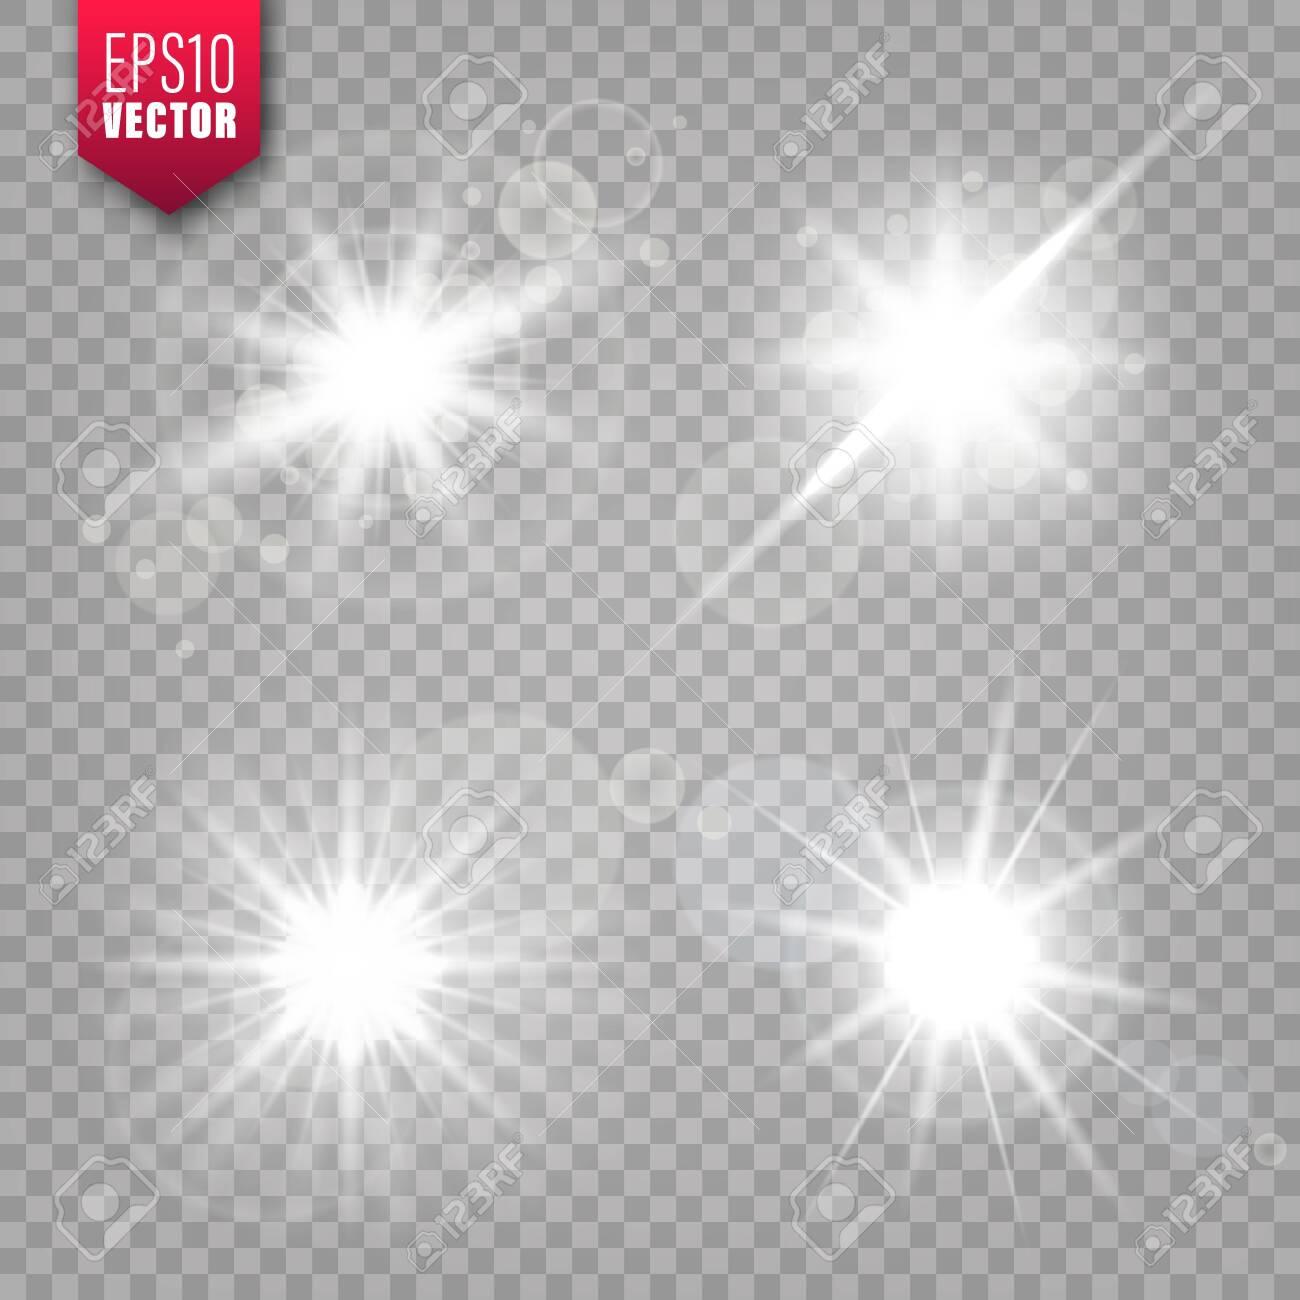 Glowing lights set on transparent background. Lens flare effect. Bright sparkling flash, sunlight. Vector illustration. - 126493959